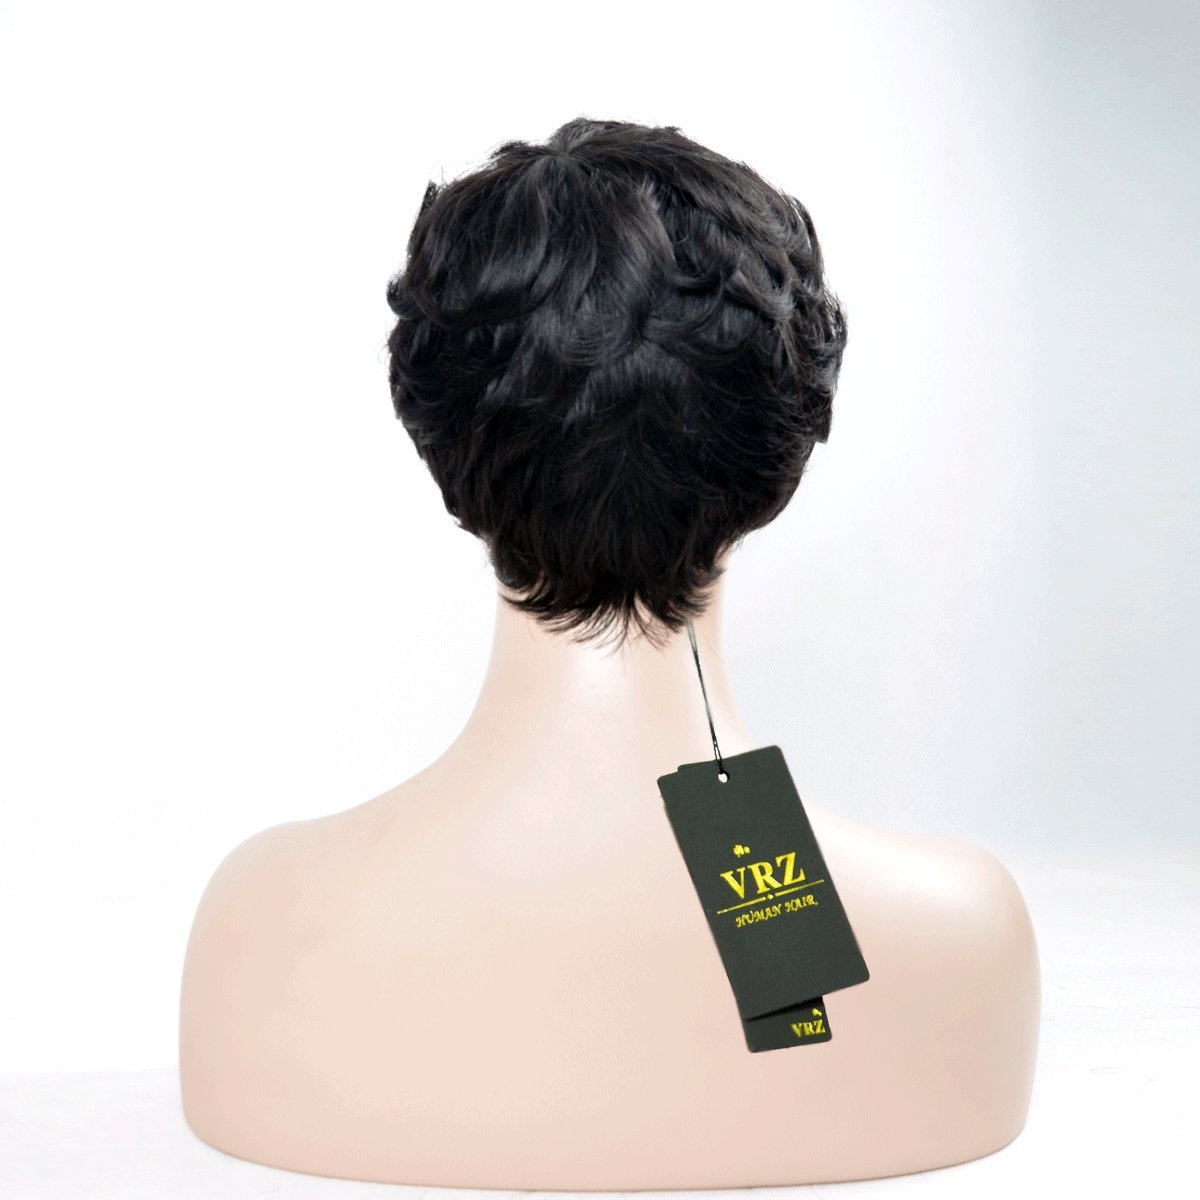 VRZ Short Black Wavy Human Hair Wigs Color 1B(8815B) by VRZ (Image #5)